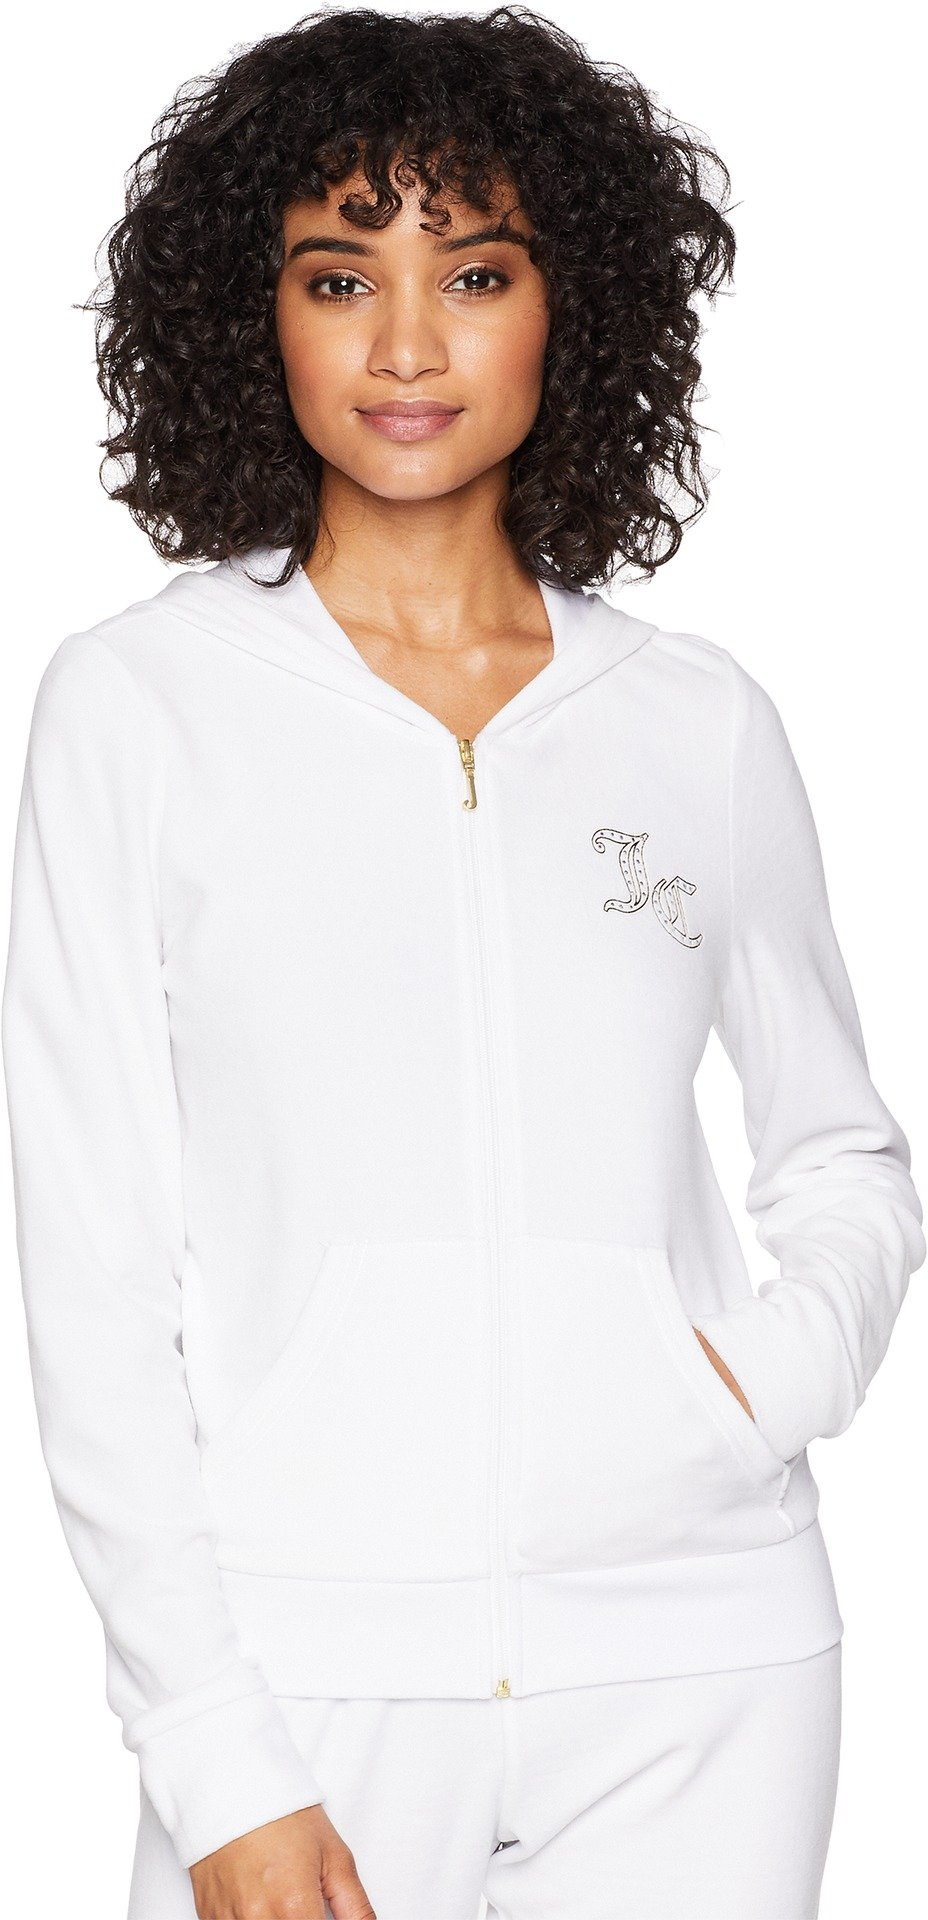 Juicy Couture Women's Robertson Jacket w/Gothic JC Logo White X-Small